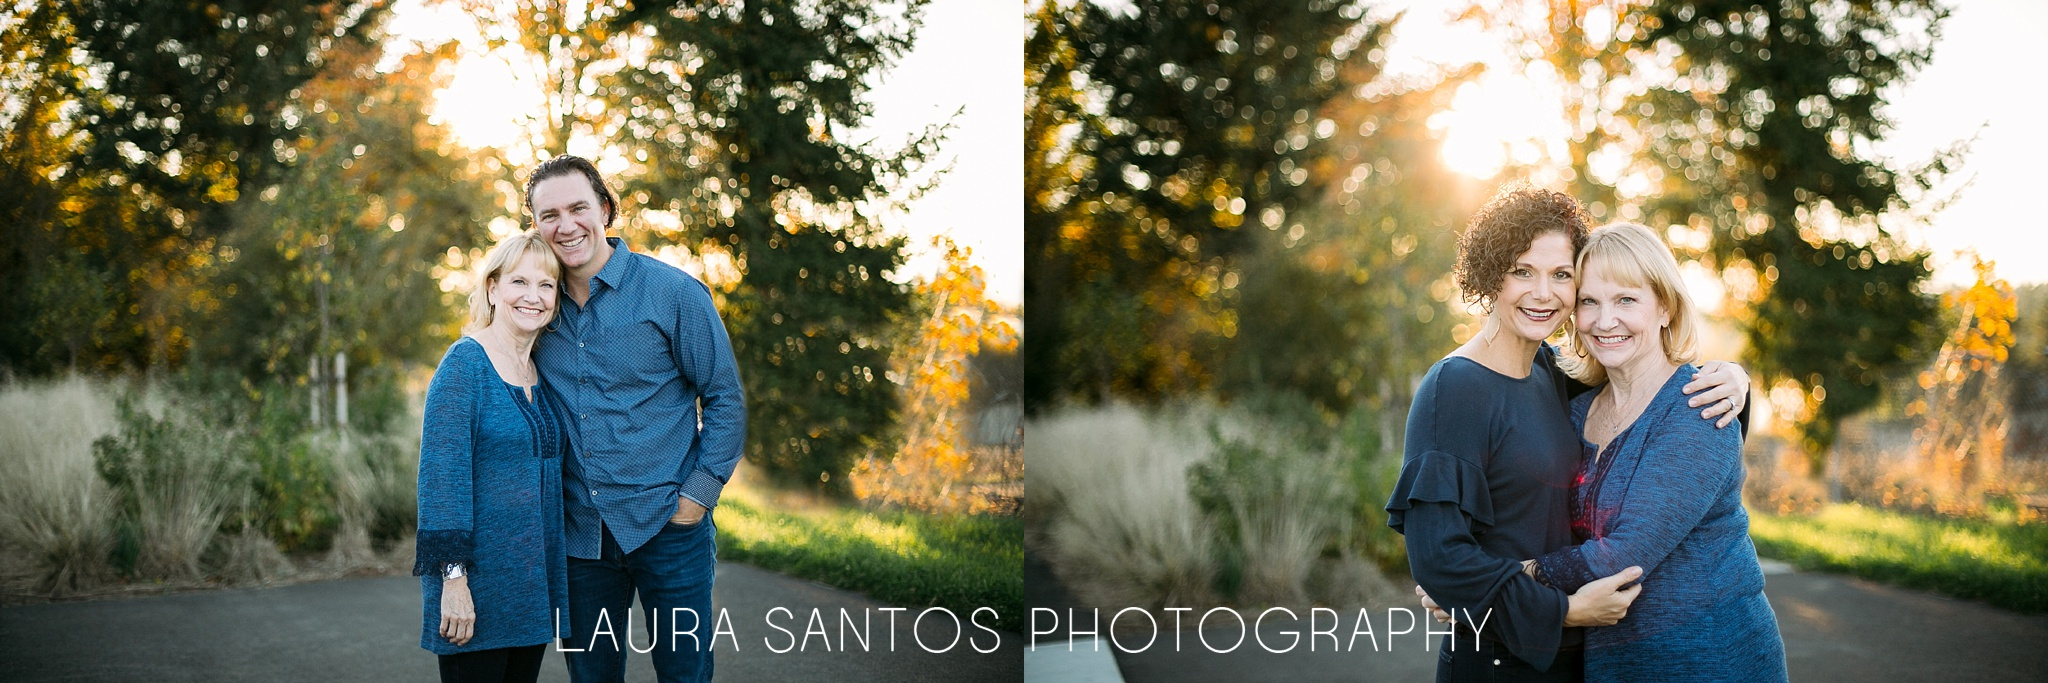 Laura Santos Photography Portland Oregon Family Photographer_0477.jpg